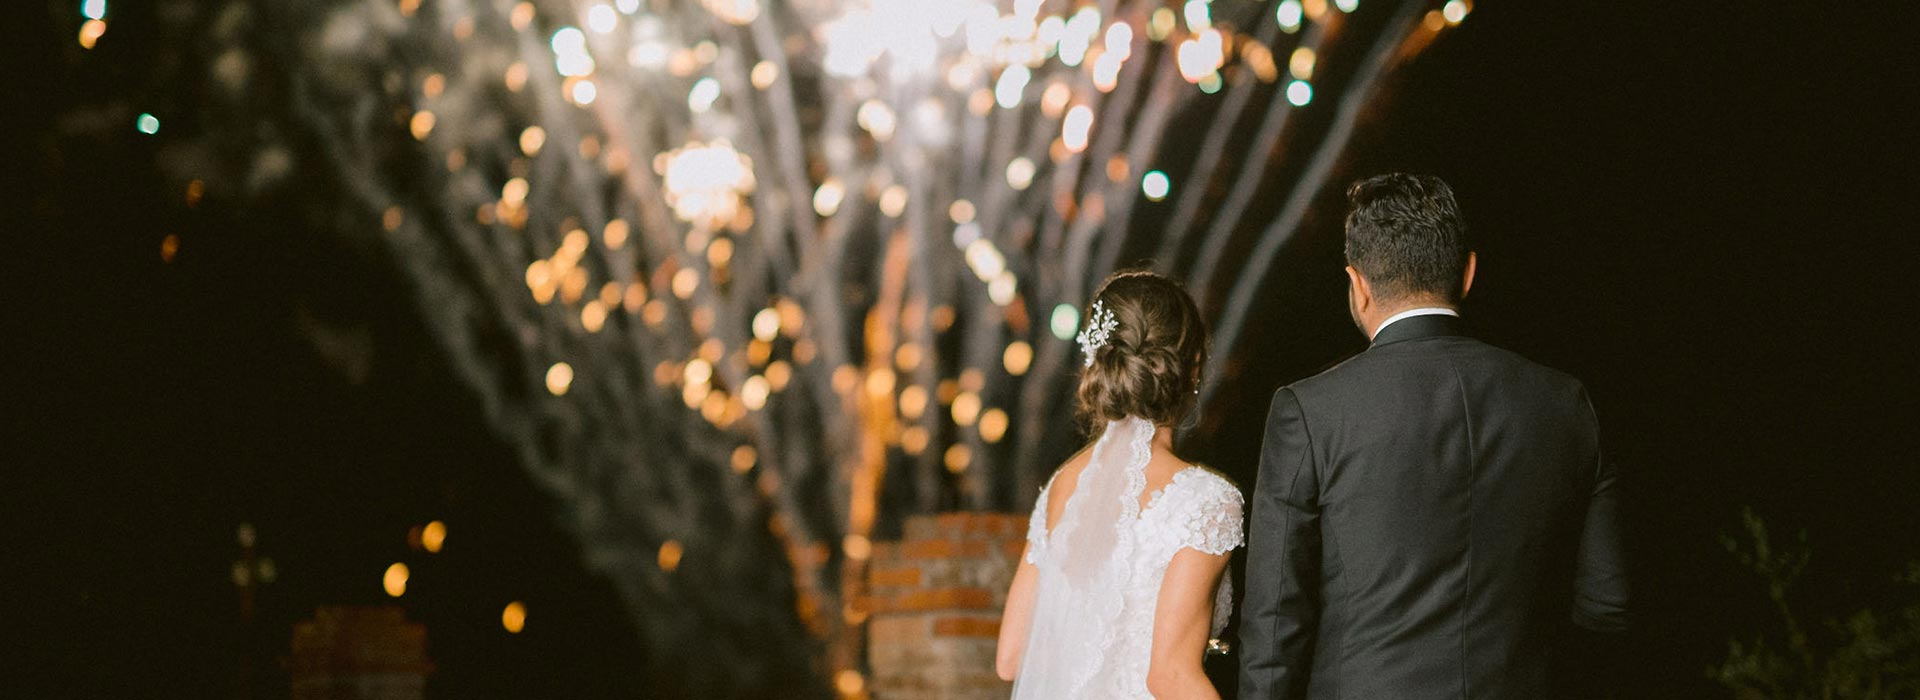 Sandra Weddings - Full Wedding Planning